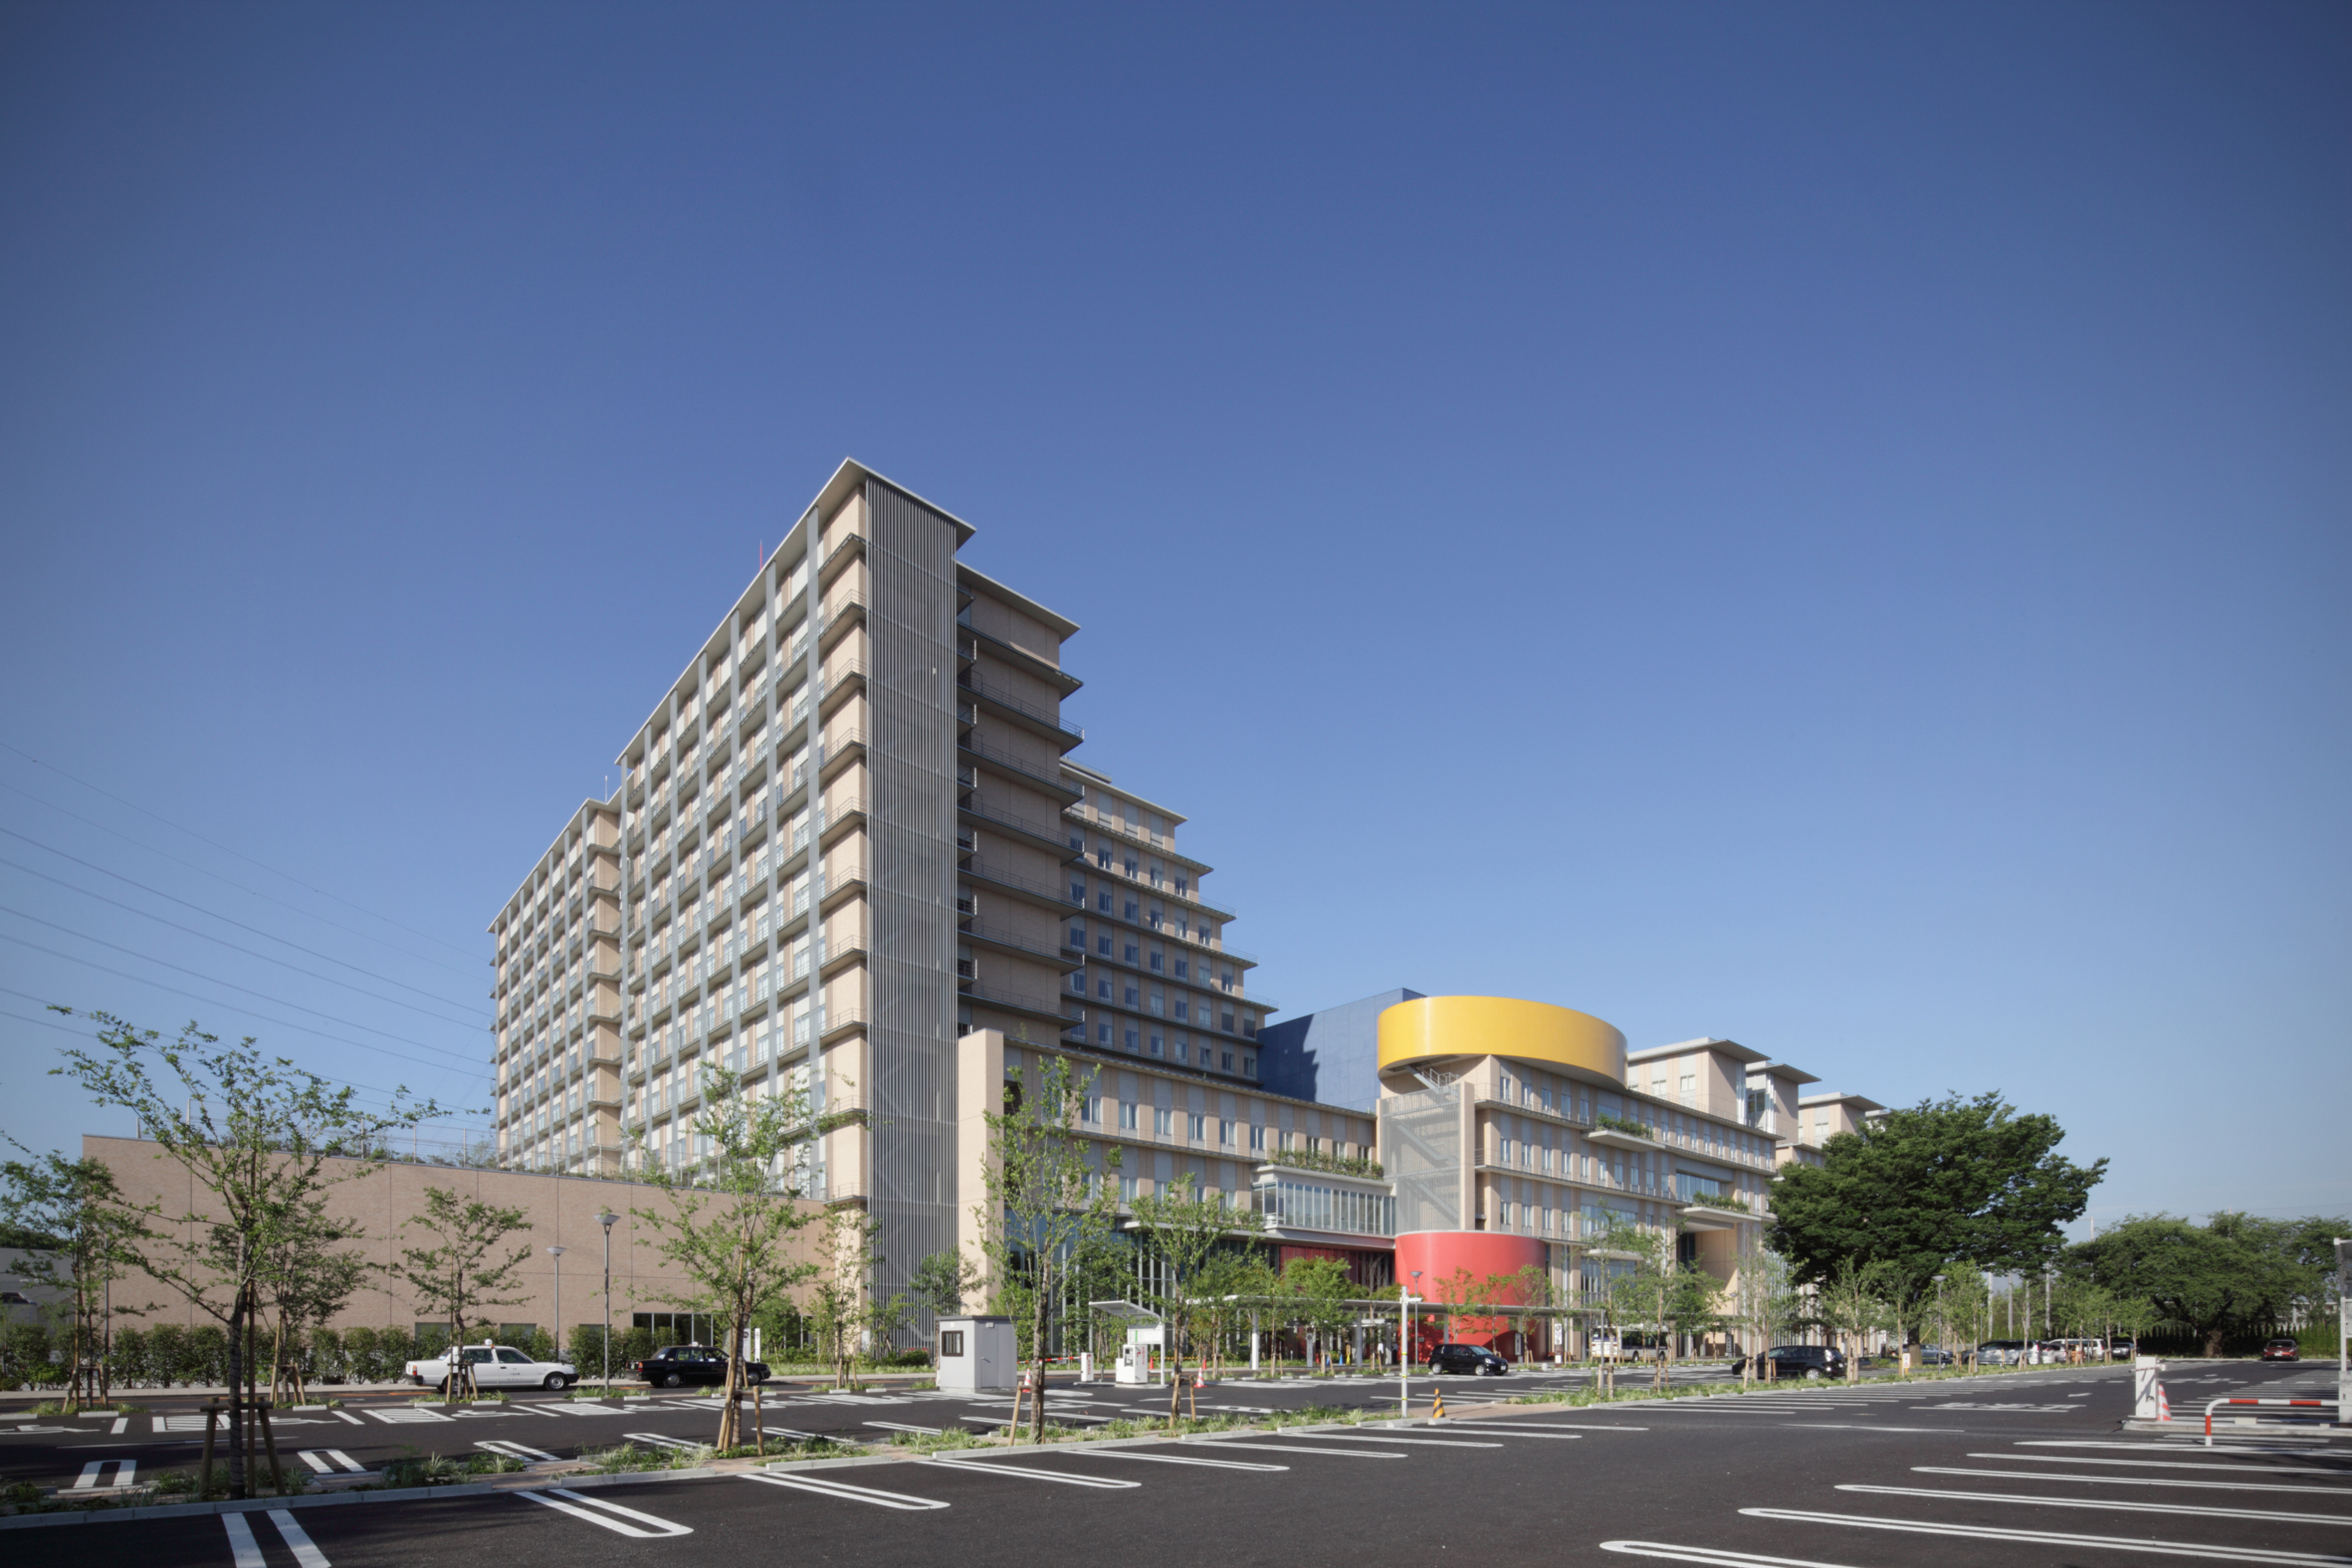 東京都立多摩総合医療センター・東京都立小児総合医療センター